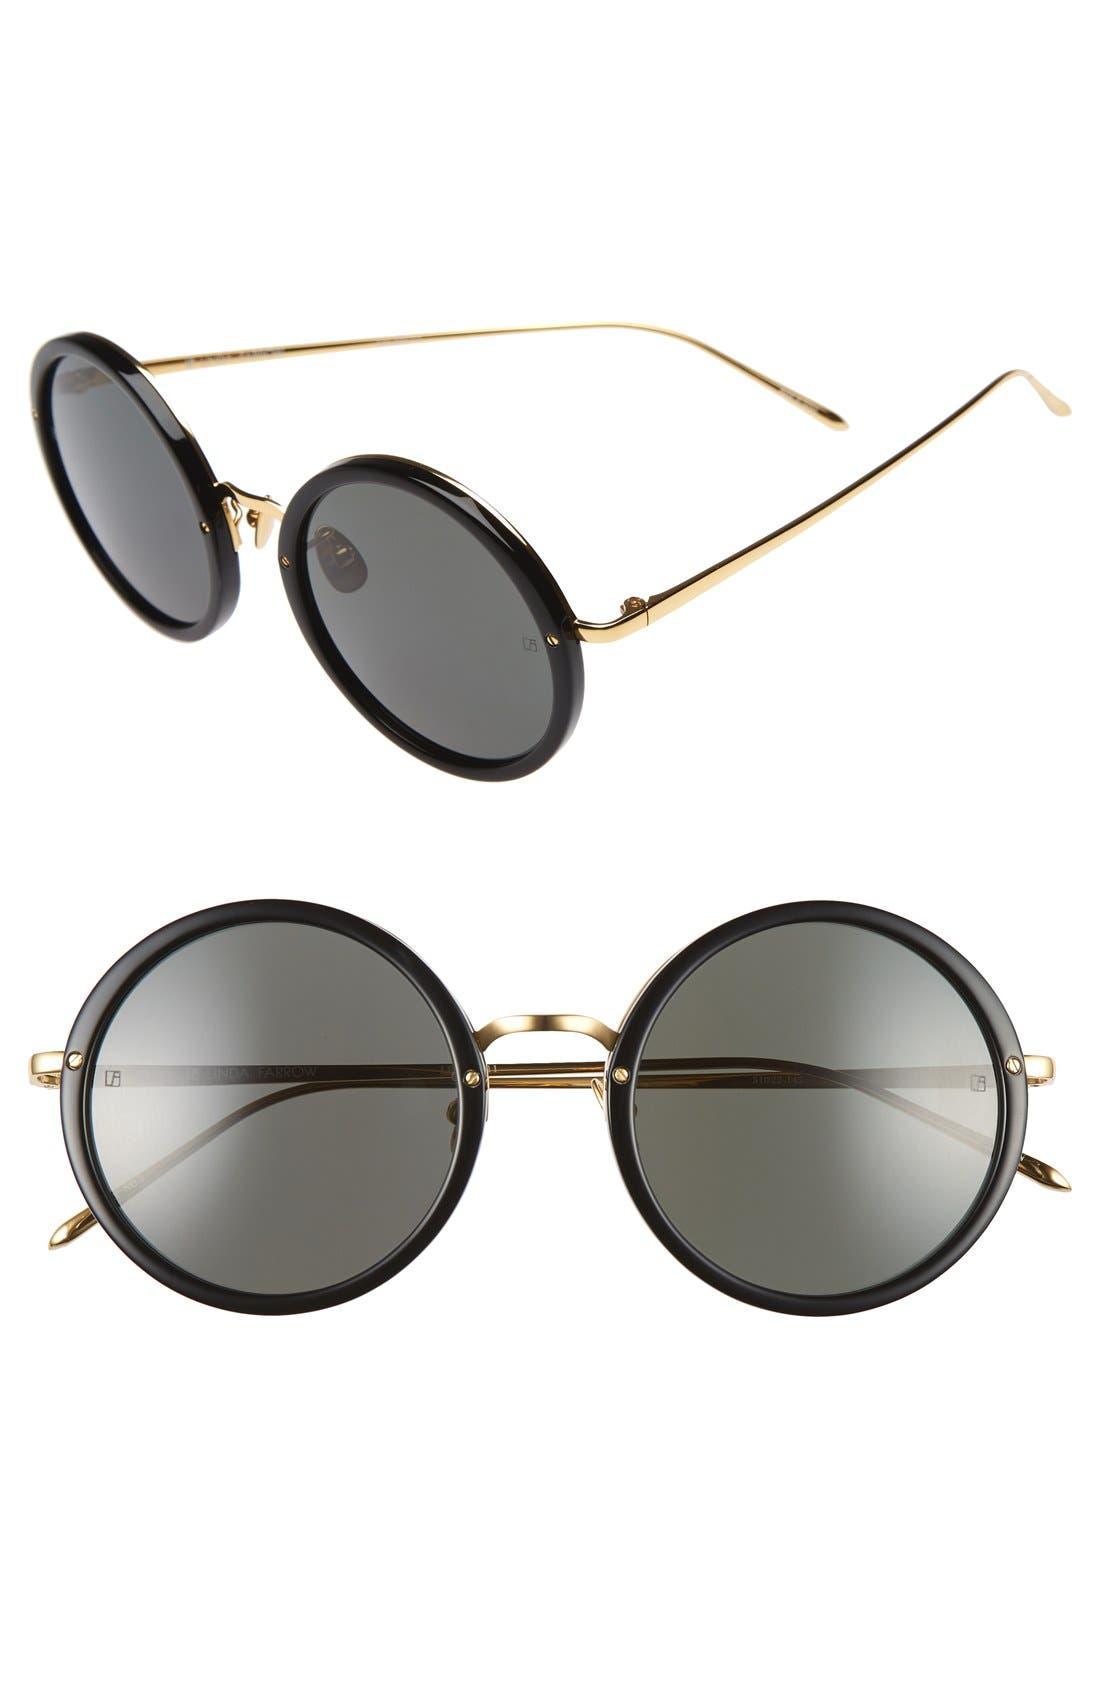 Linda Farrow 51mm Round 24 Karat Gold Trim Sunglasses